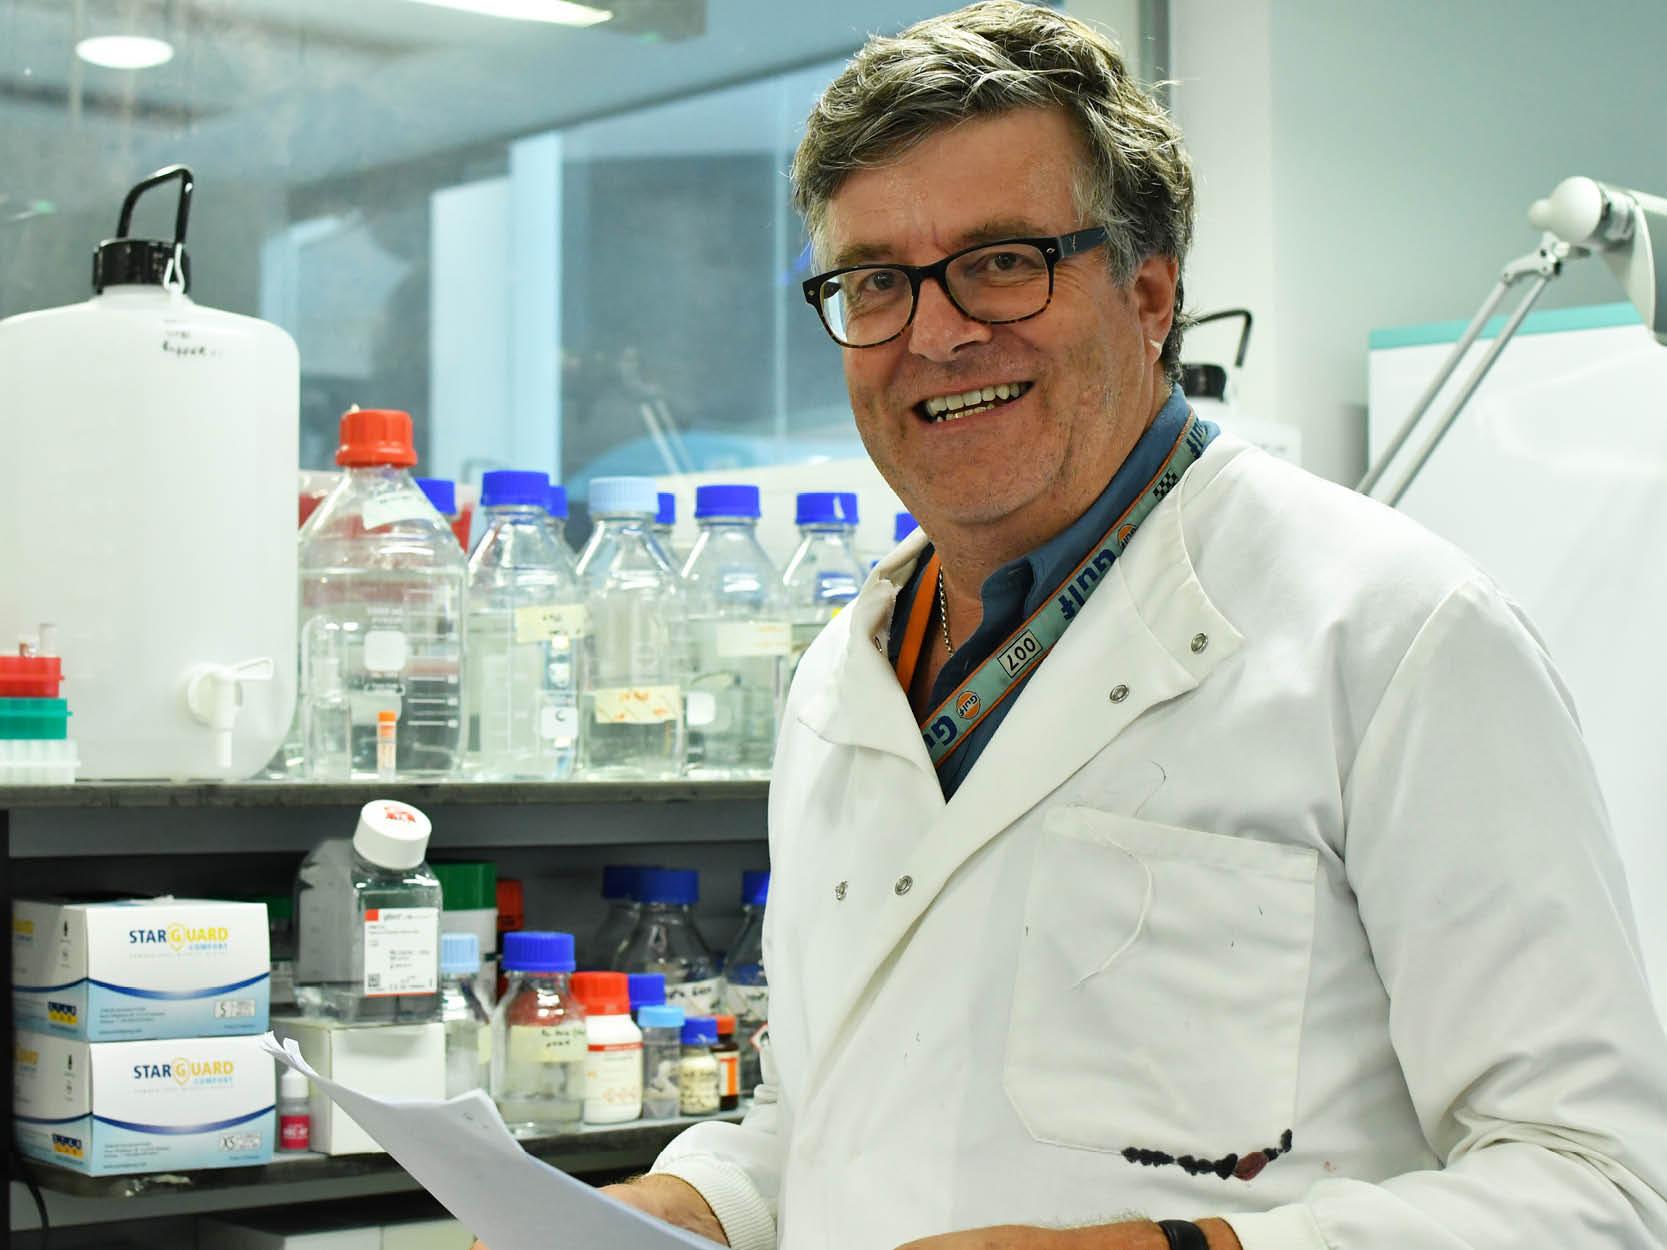 Professor Mike Philpott